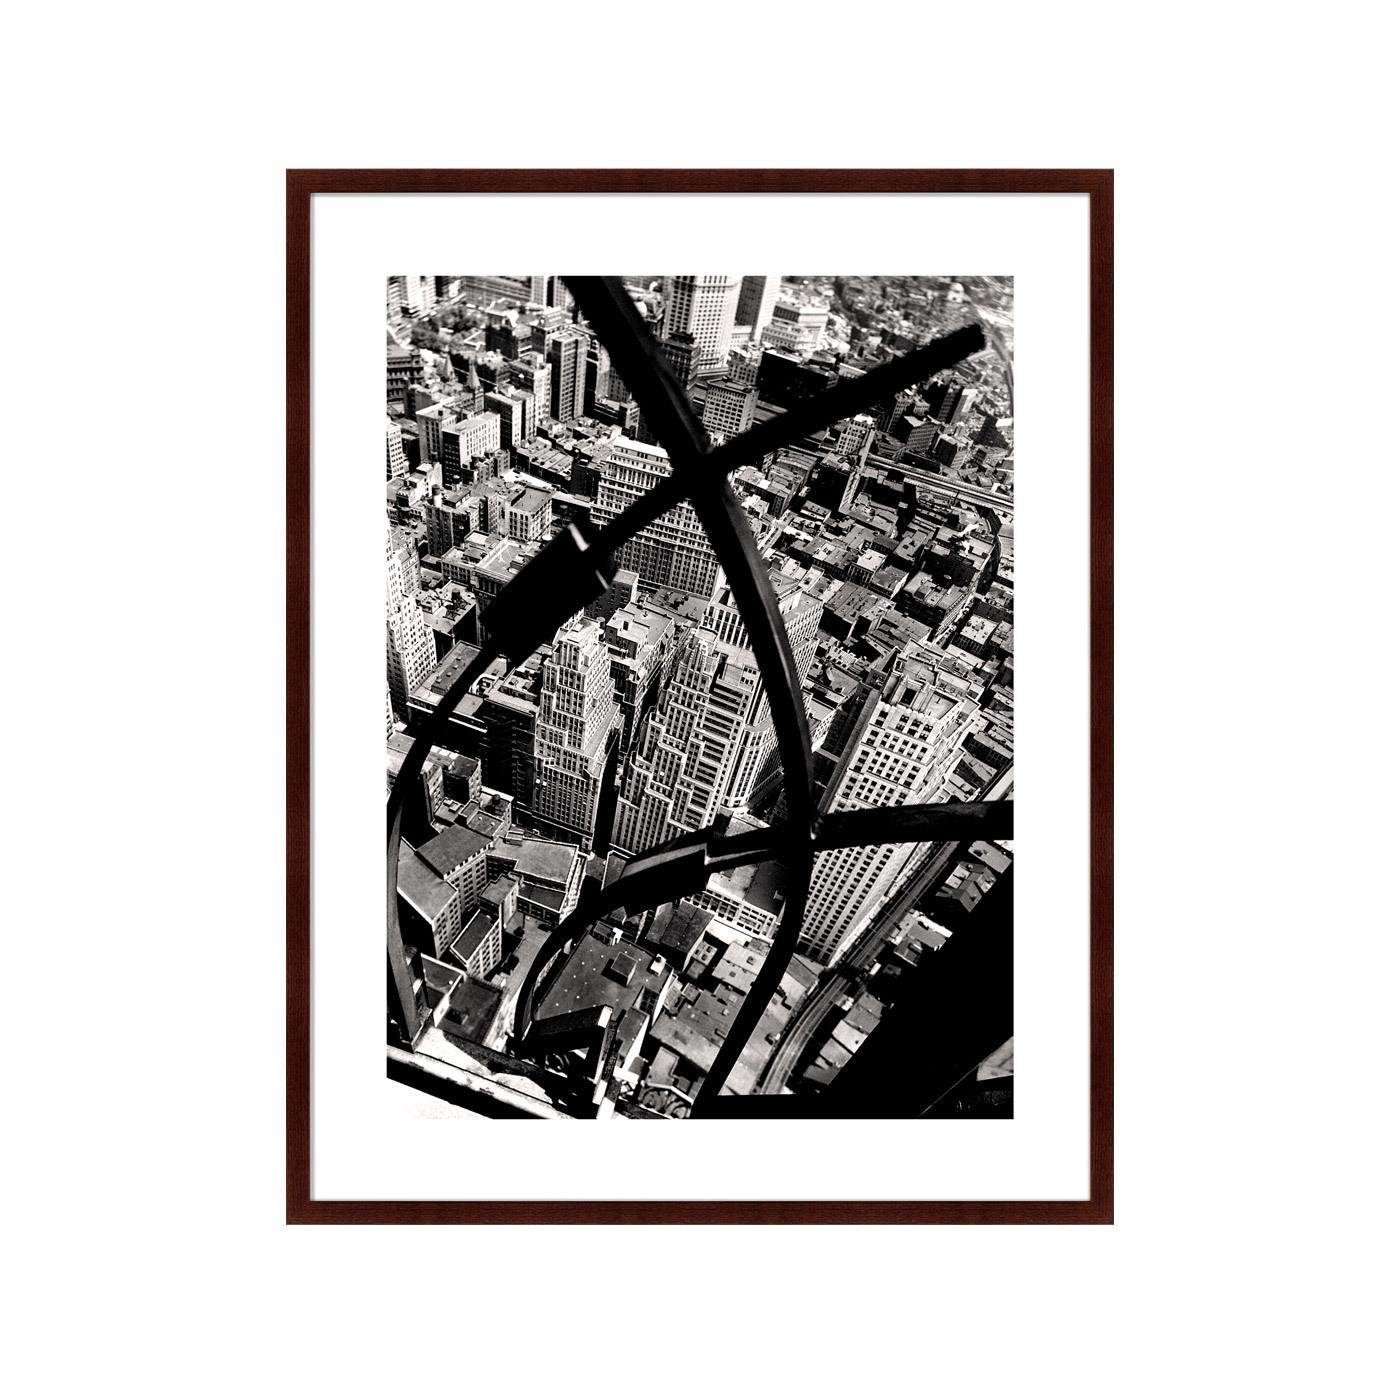 {} Картины в Квартиру Картина Улицы Нью-Йорка (102х130 см) картины в квартиру картина etude 3 102х130 см